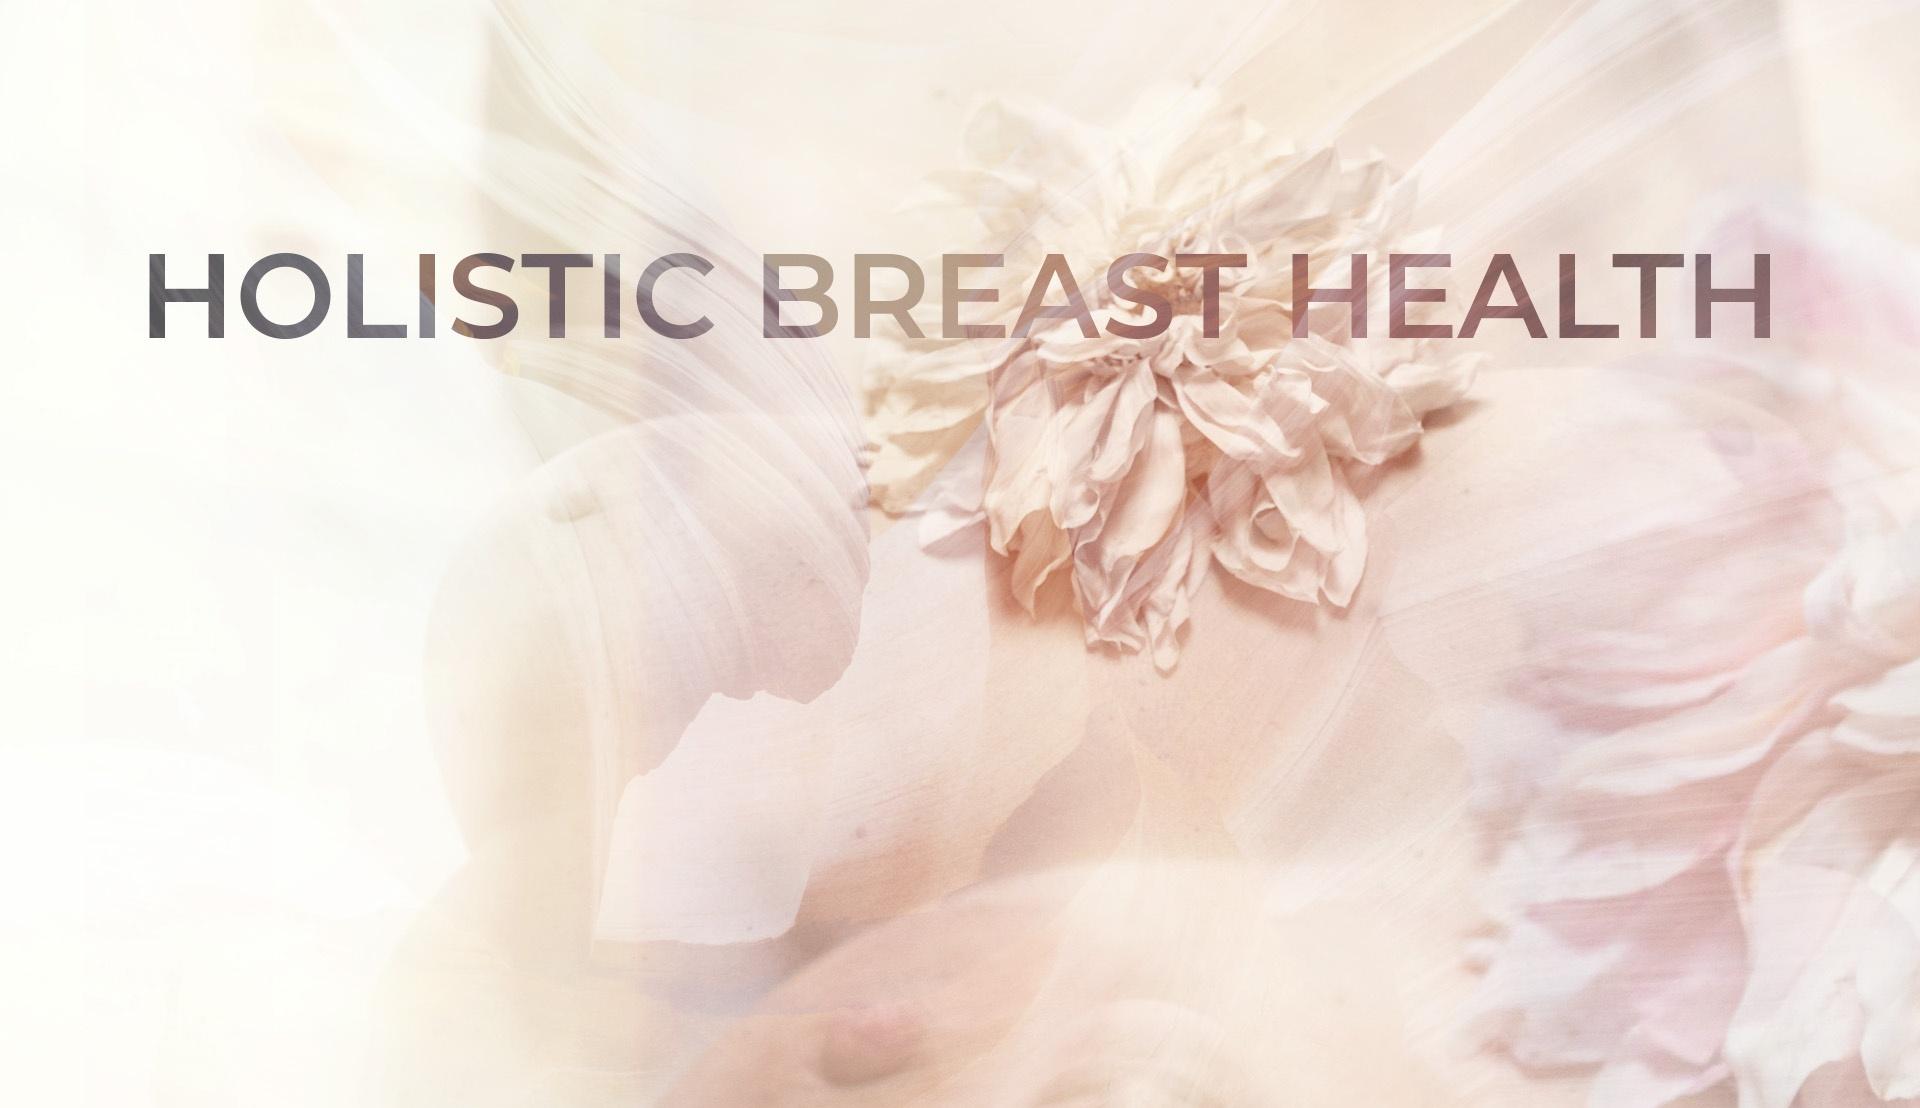 Holistic Breast Health